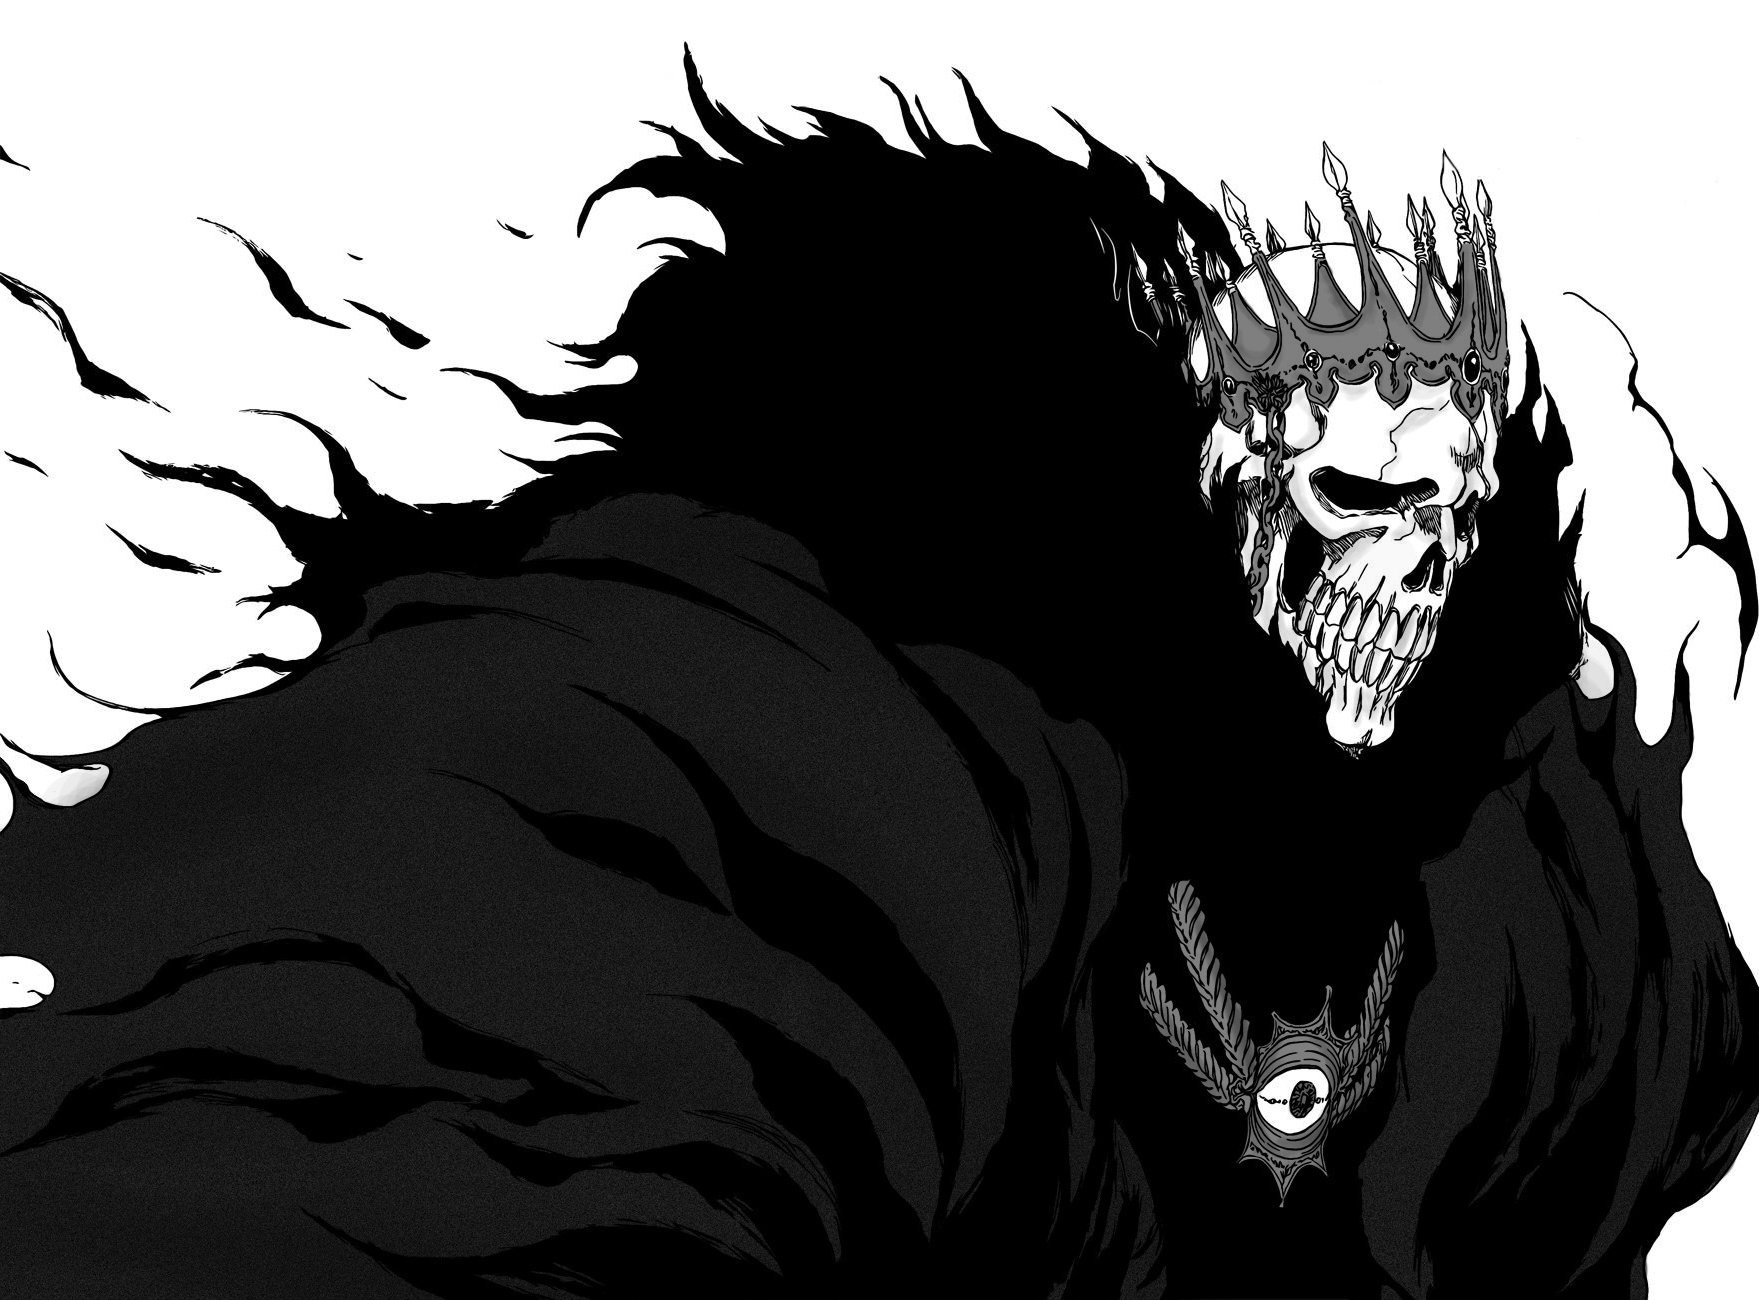 Bleach Skull Wallpaper Skulls Bleach Espada Barragan